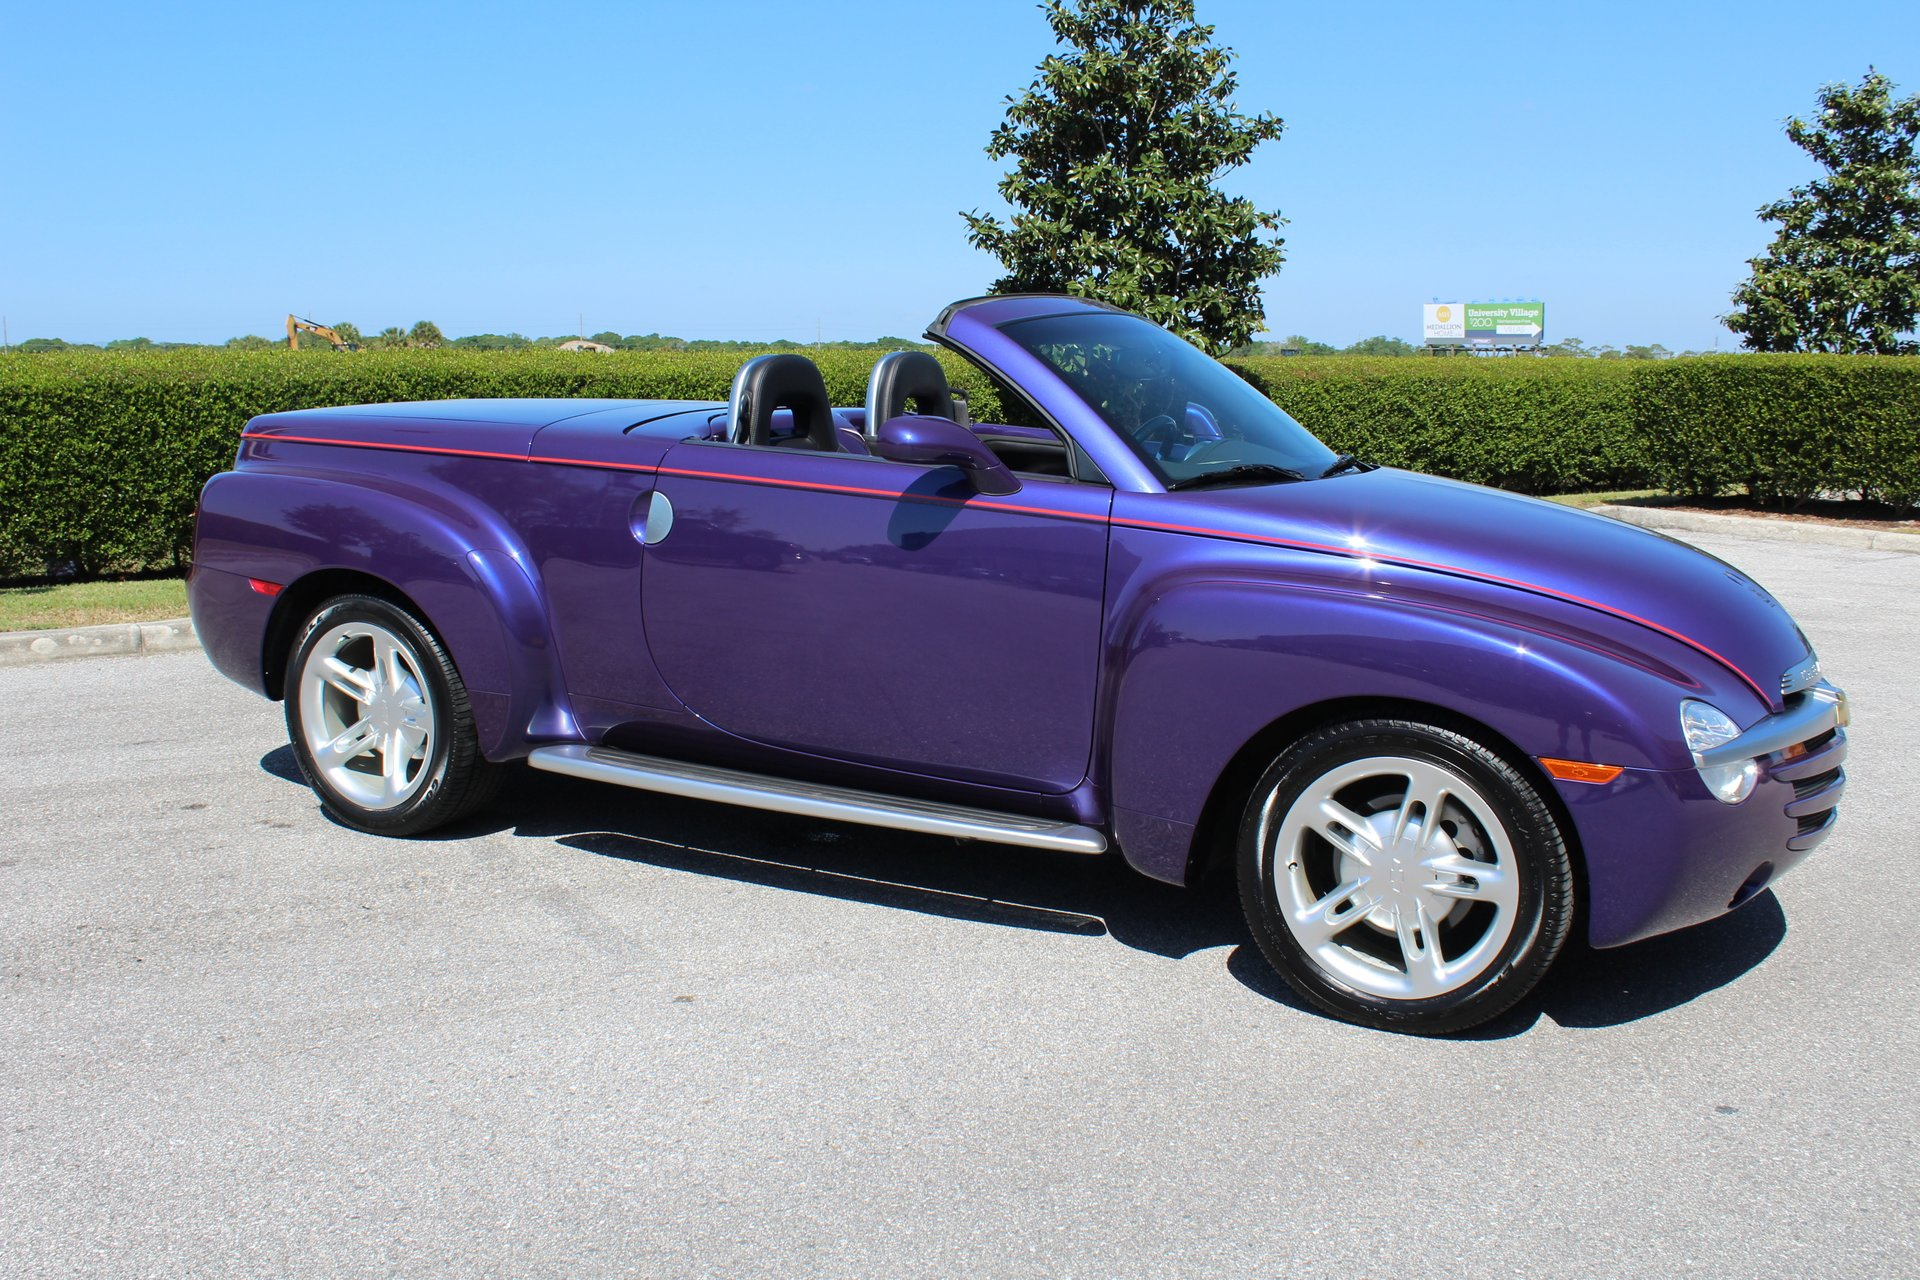 2004 Chevrolet Ssr Classic Cars Of Sarasota